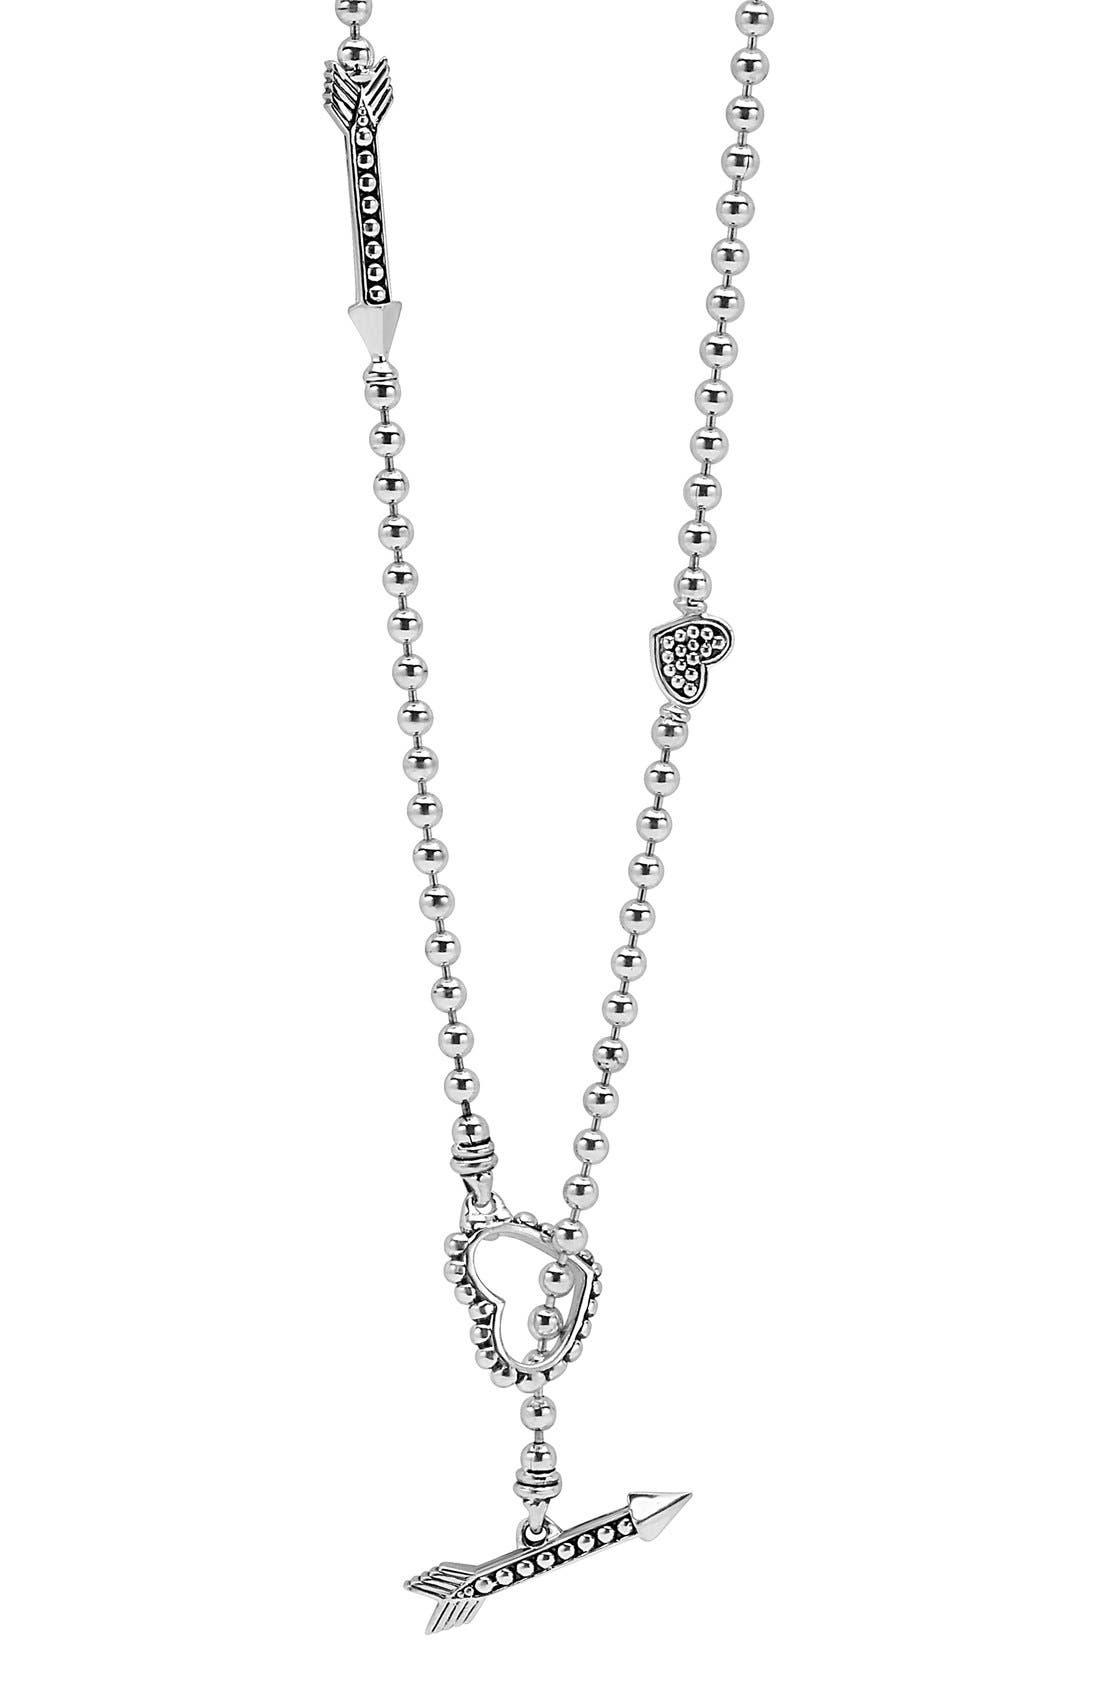 LAGOS 'Beloved' Heart & Arrow Link Necklace